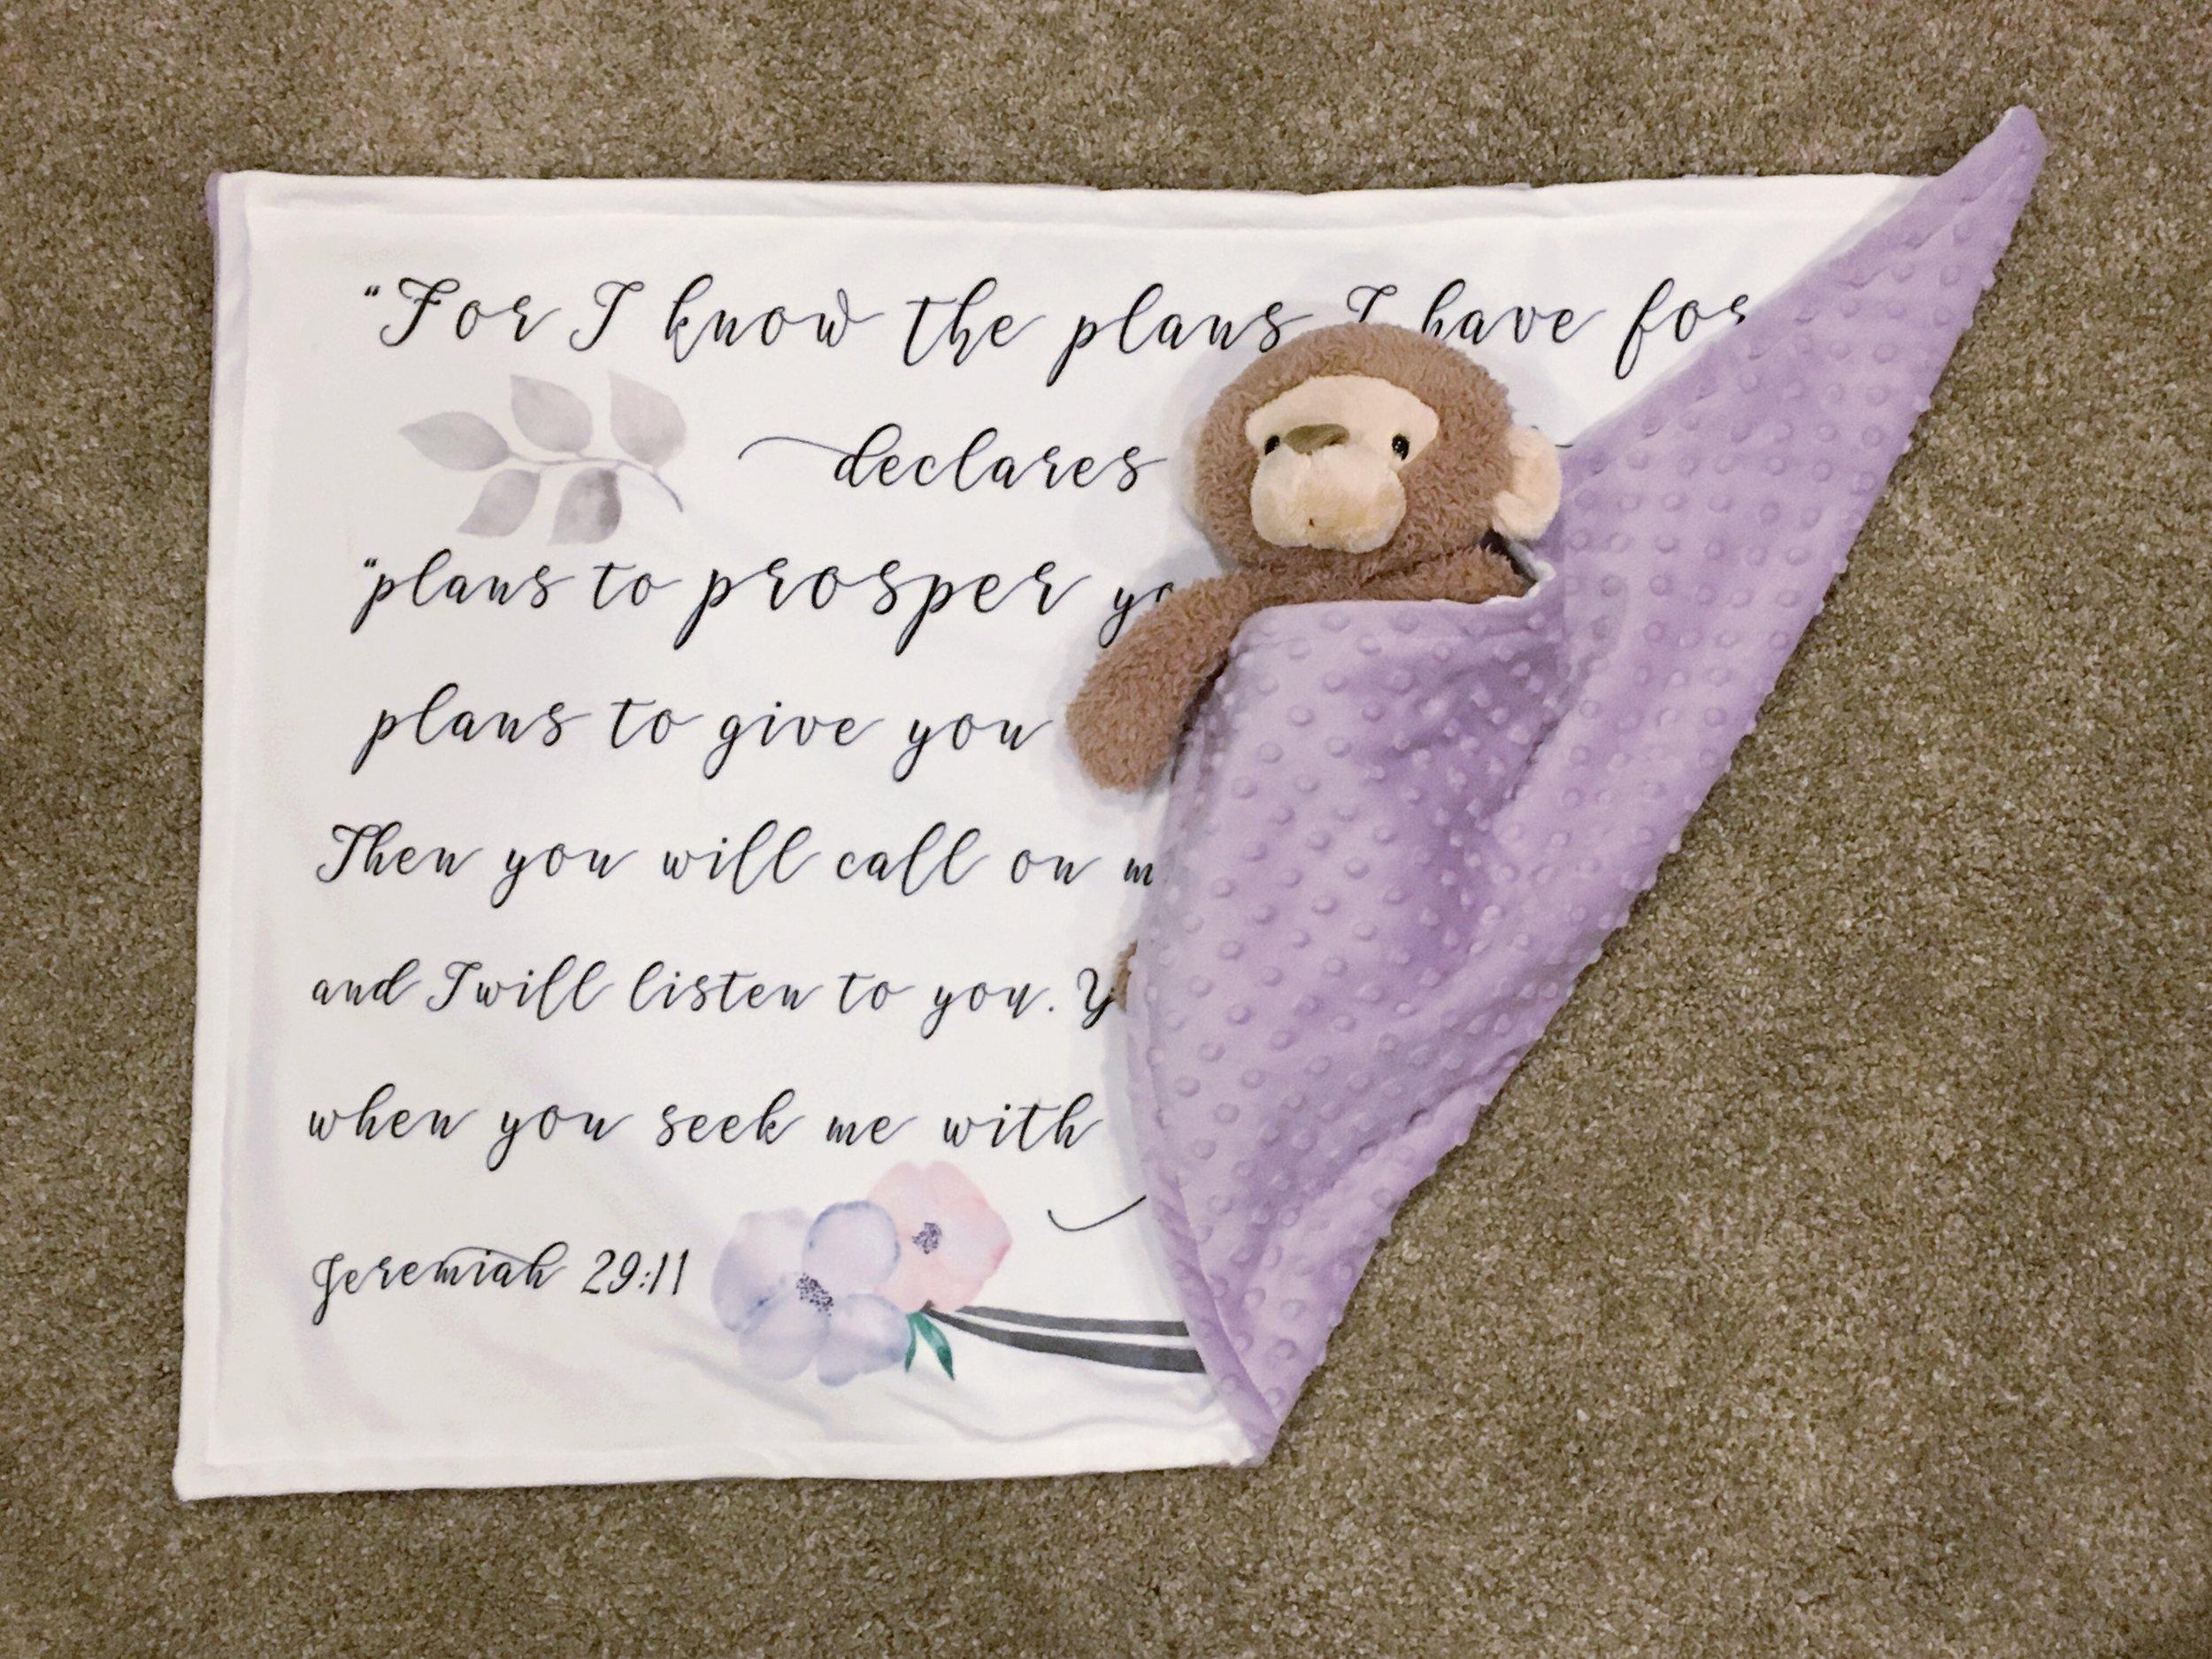 Central PA, Baby Blanket, Hand lettered, JesSmith Designs, Invitations, custom-04-15 06.24.14.jpg